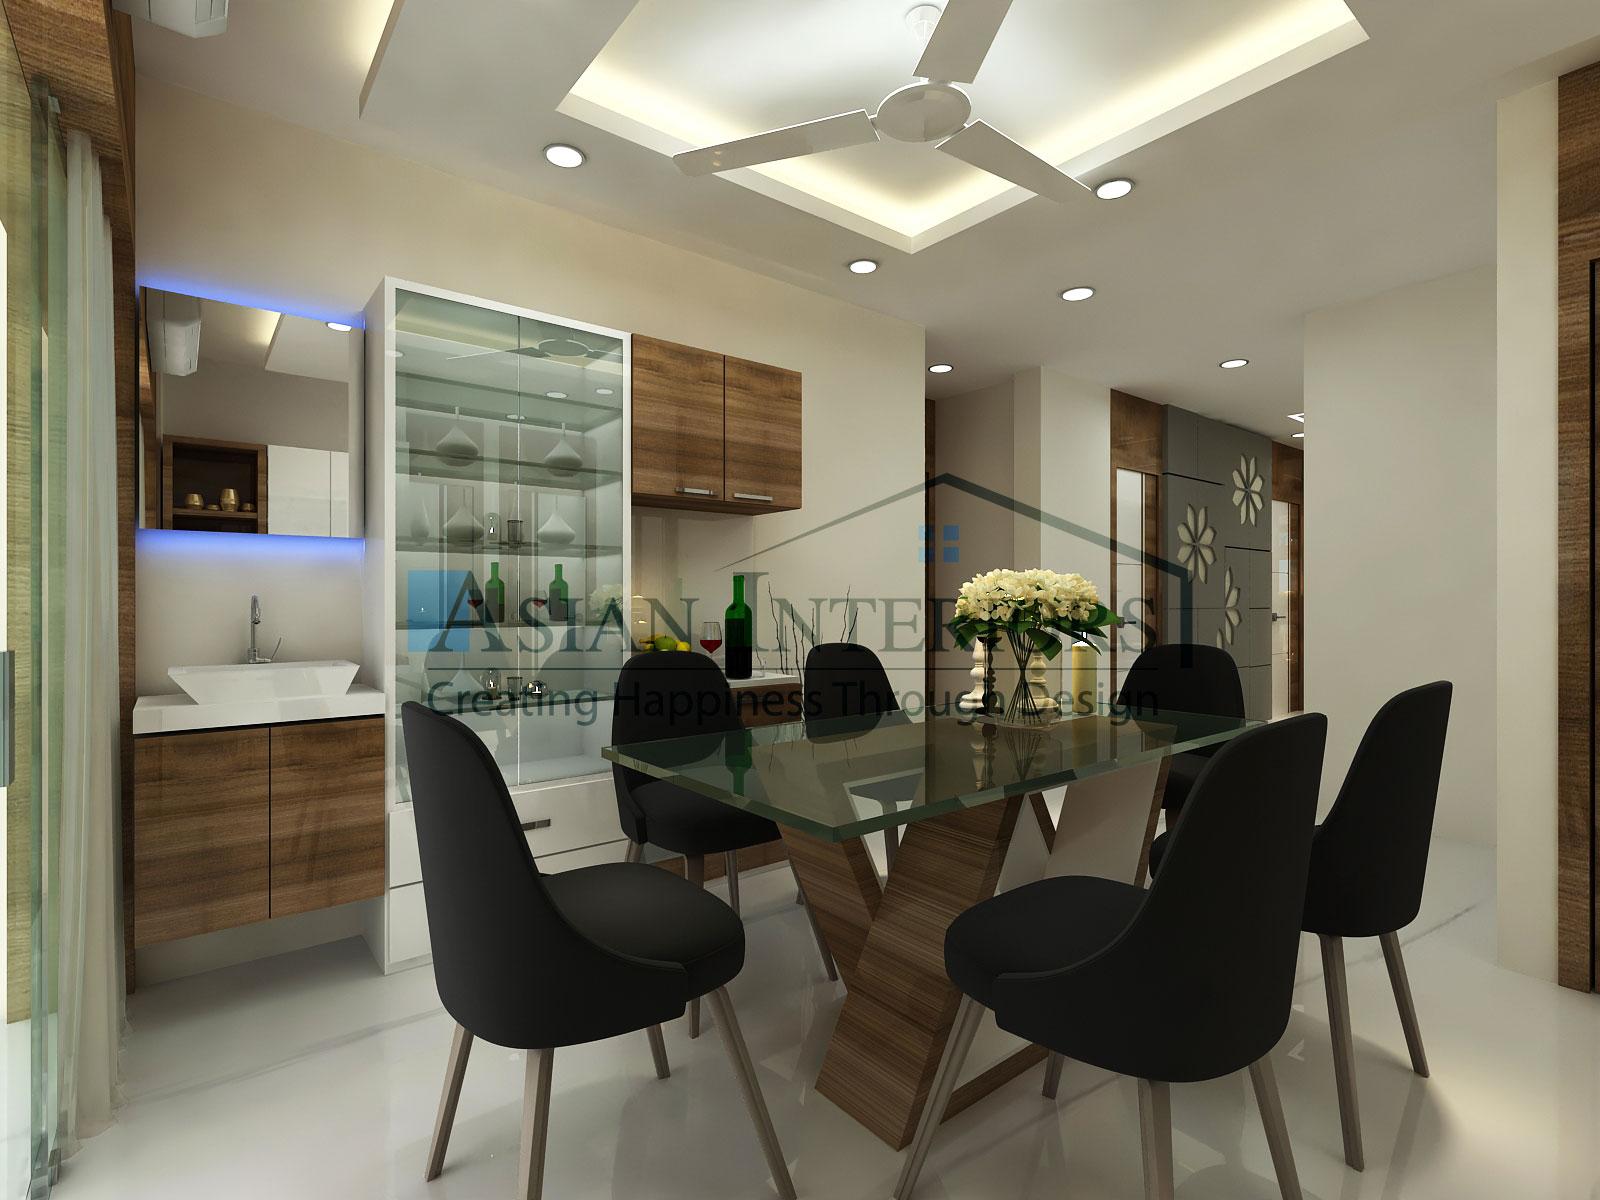 Asian-Interiors-DrawingRoom10